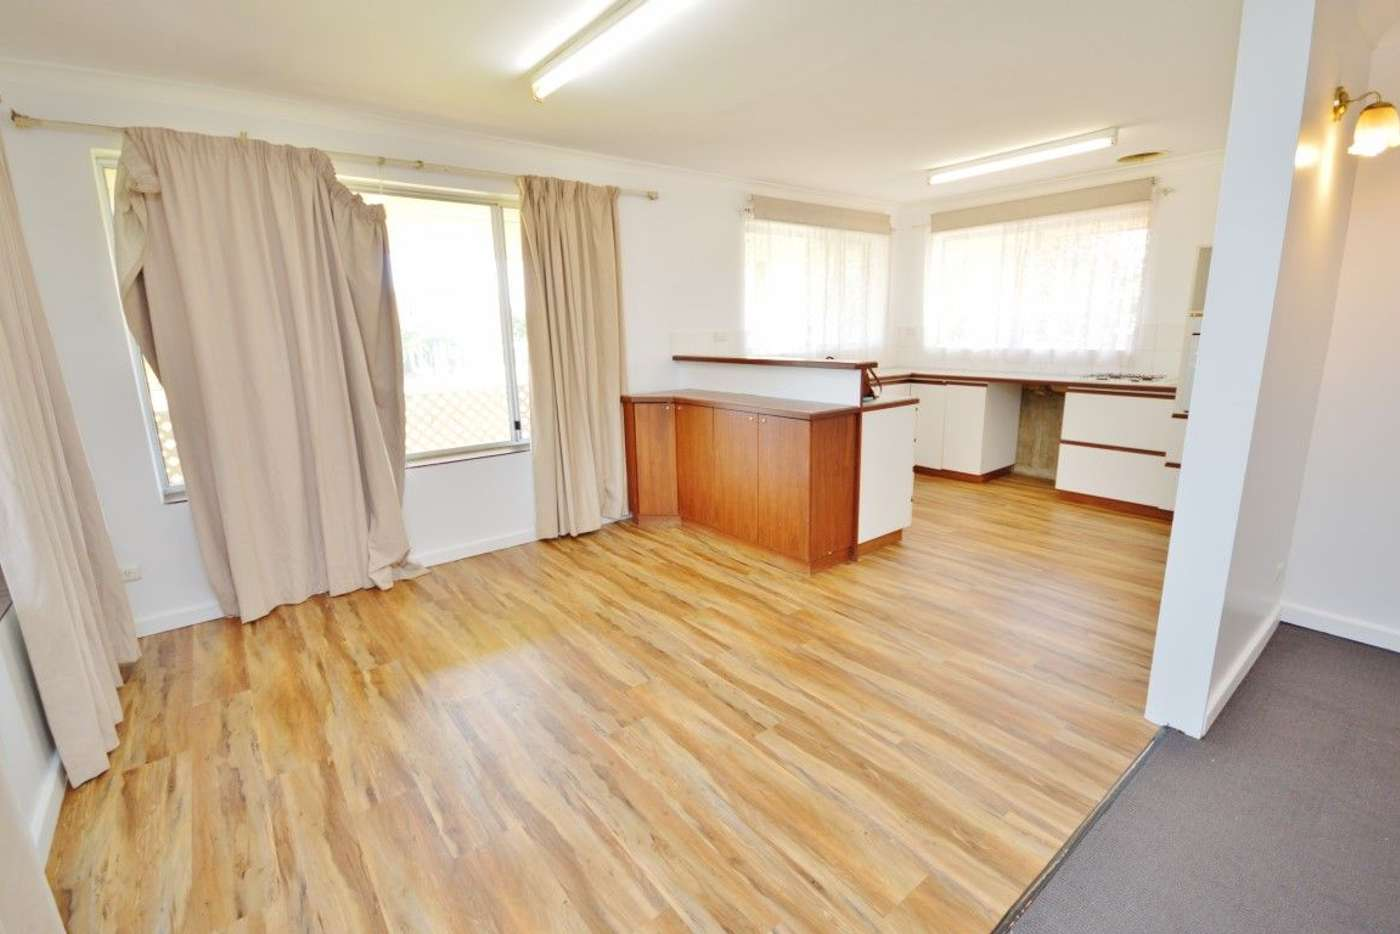 Seventh view of Homely house listing, 15 Mallard Street, Kalbarri WA 6536